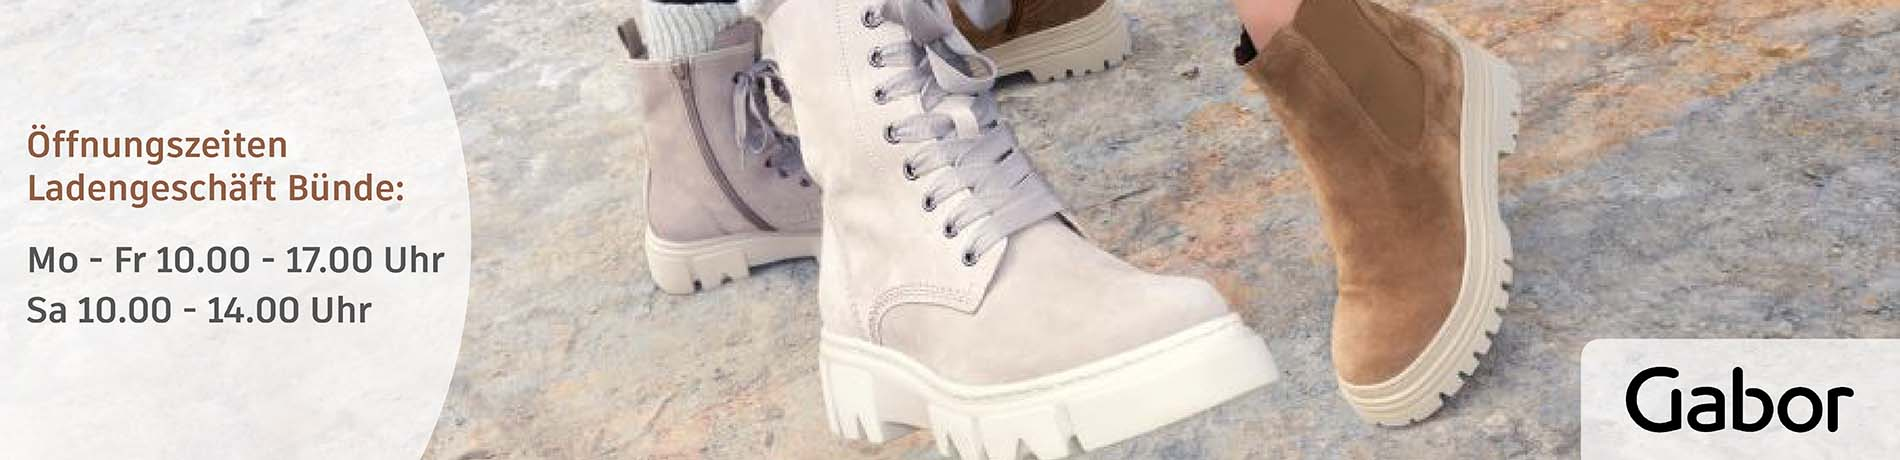 Gabor Schuhe online Vormbrock Buende